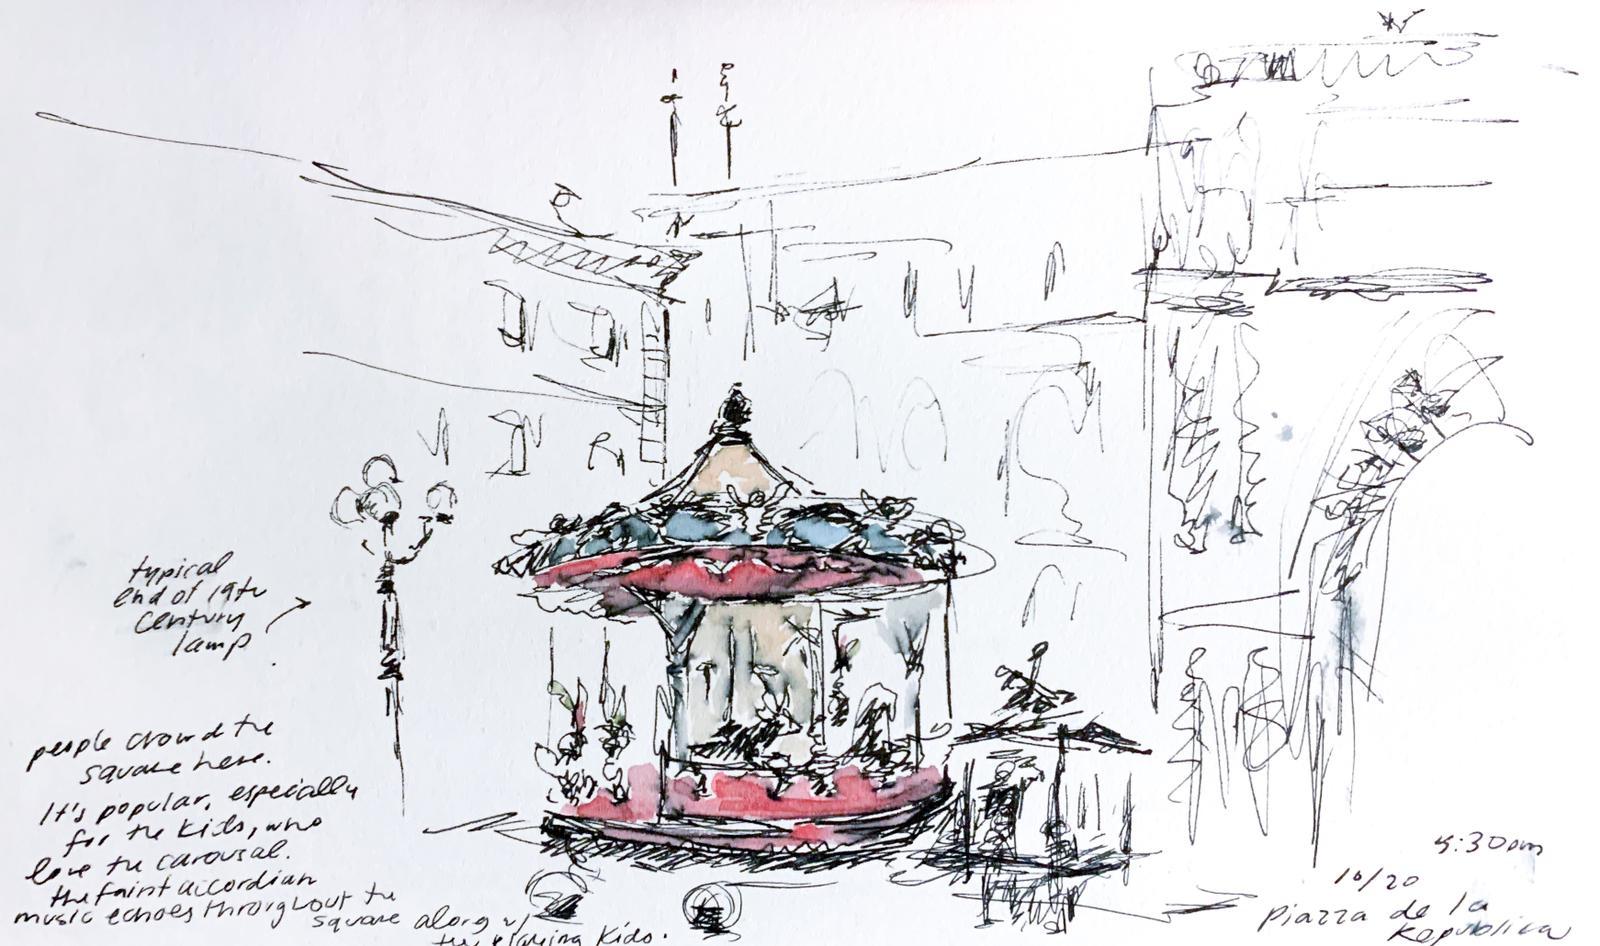 Aleksandra Tsangarides Hinsdale, Massachusetts Endicott College size A4 Pen on paper Piazza della Repubblica